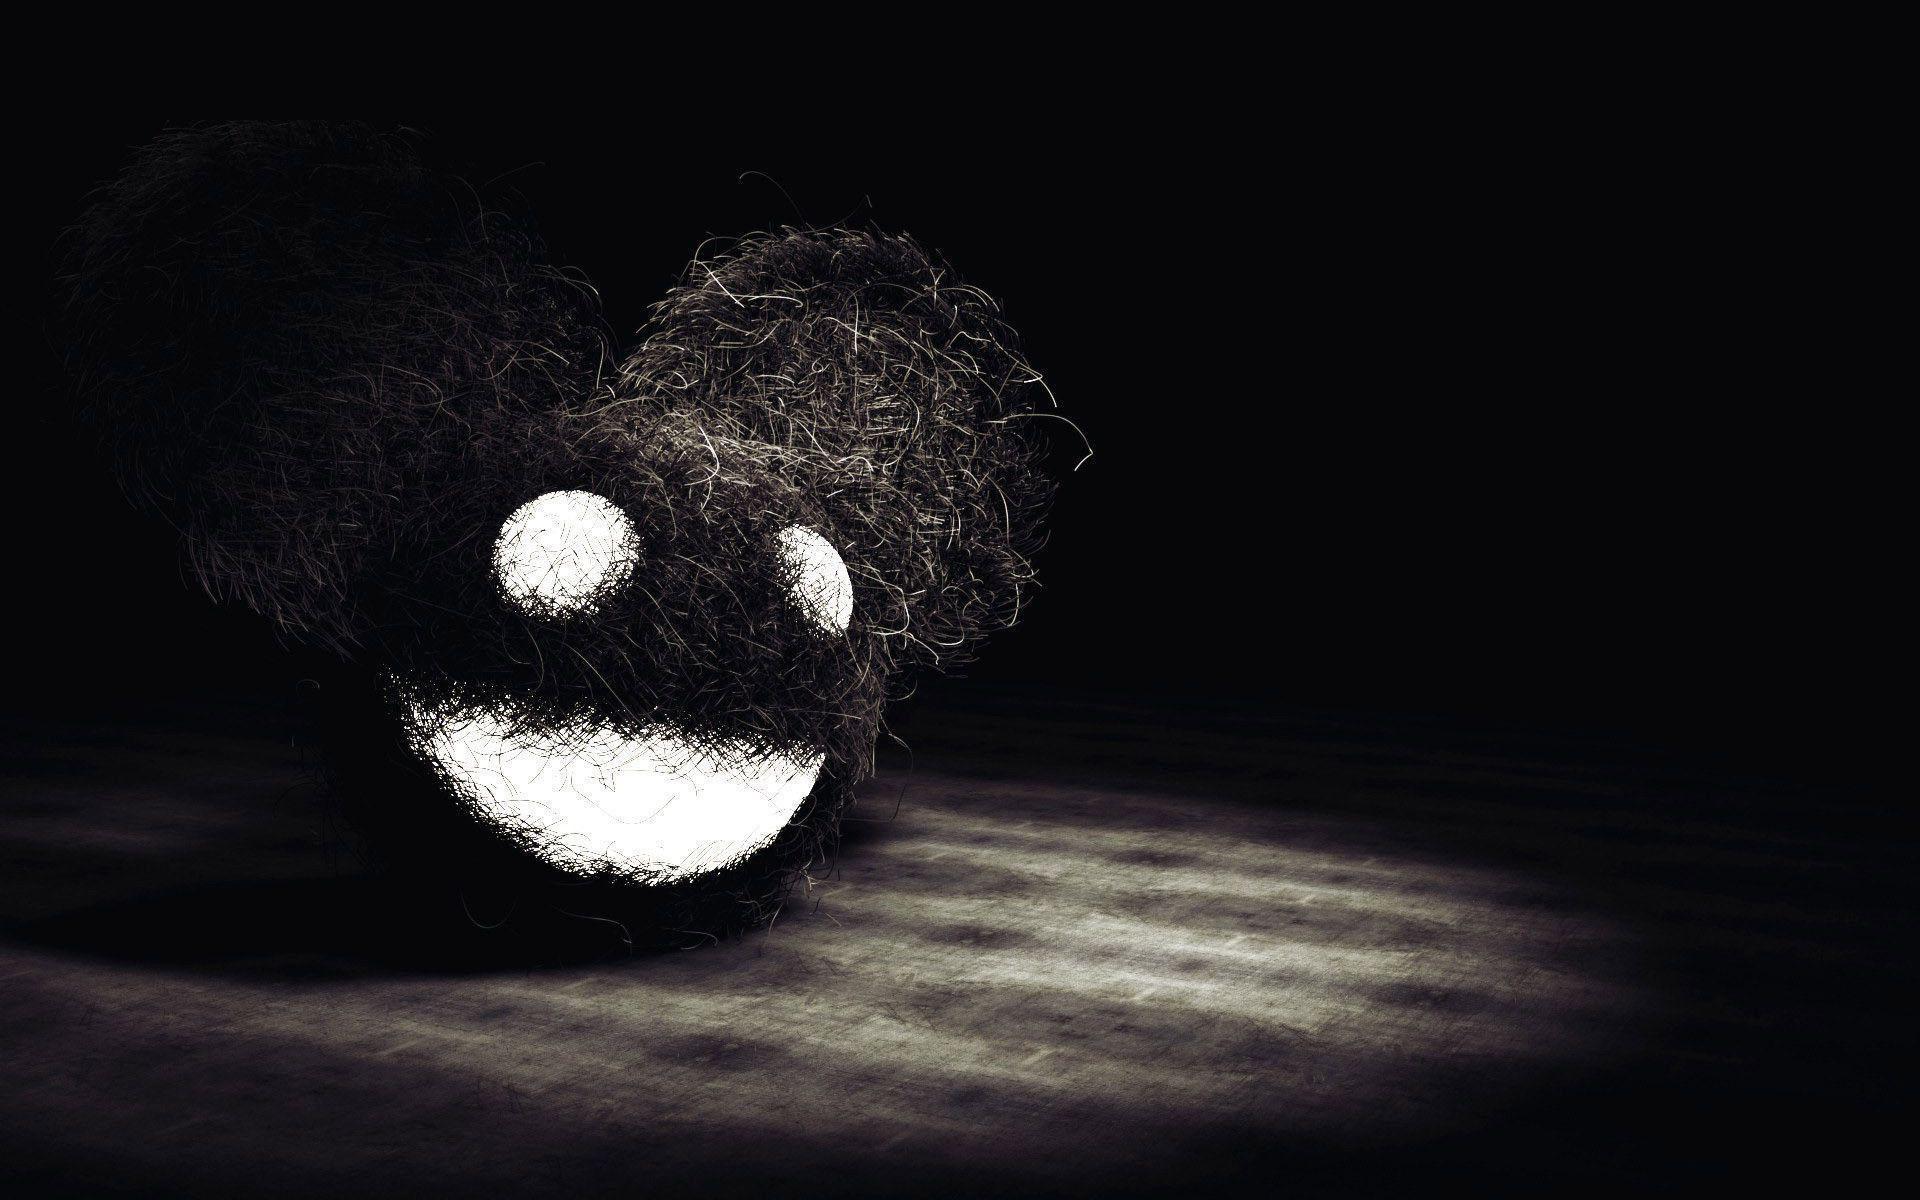 black background 1920x1200 - photo #44